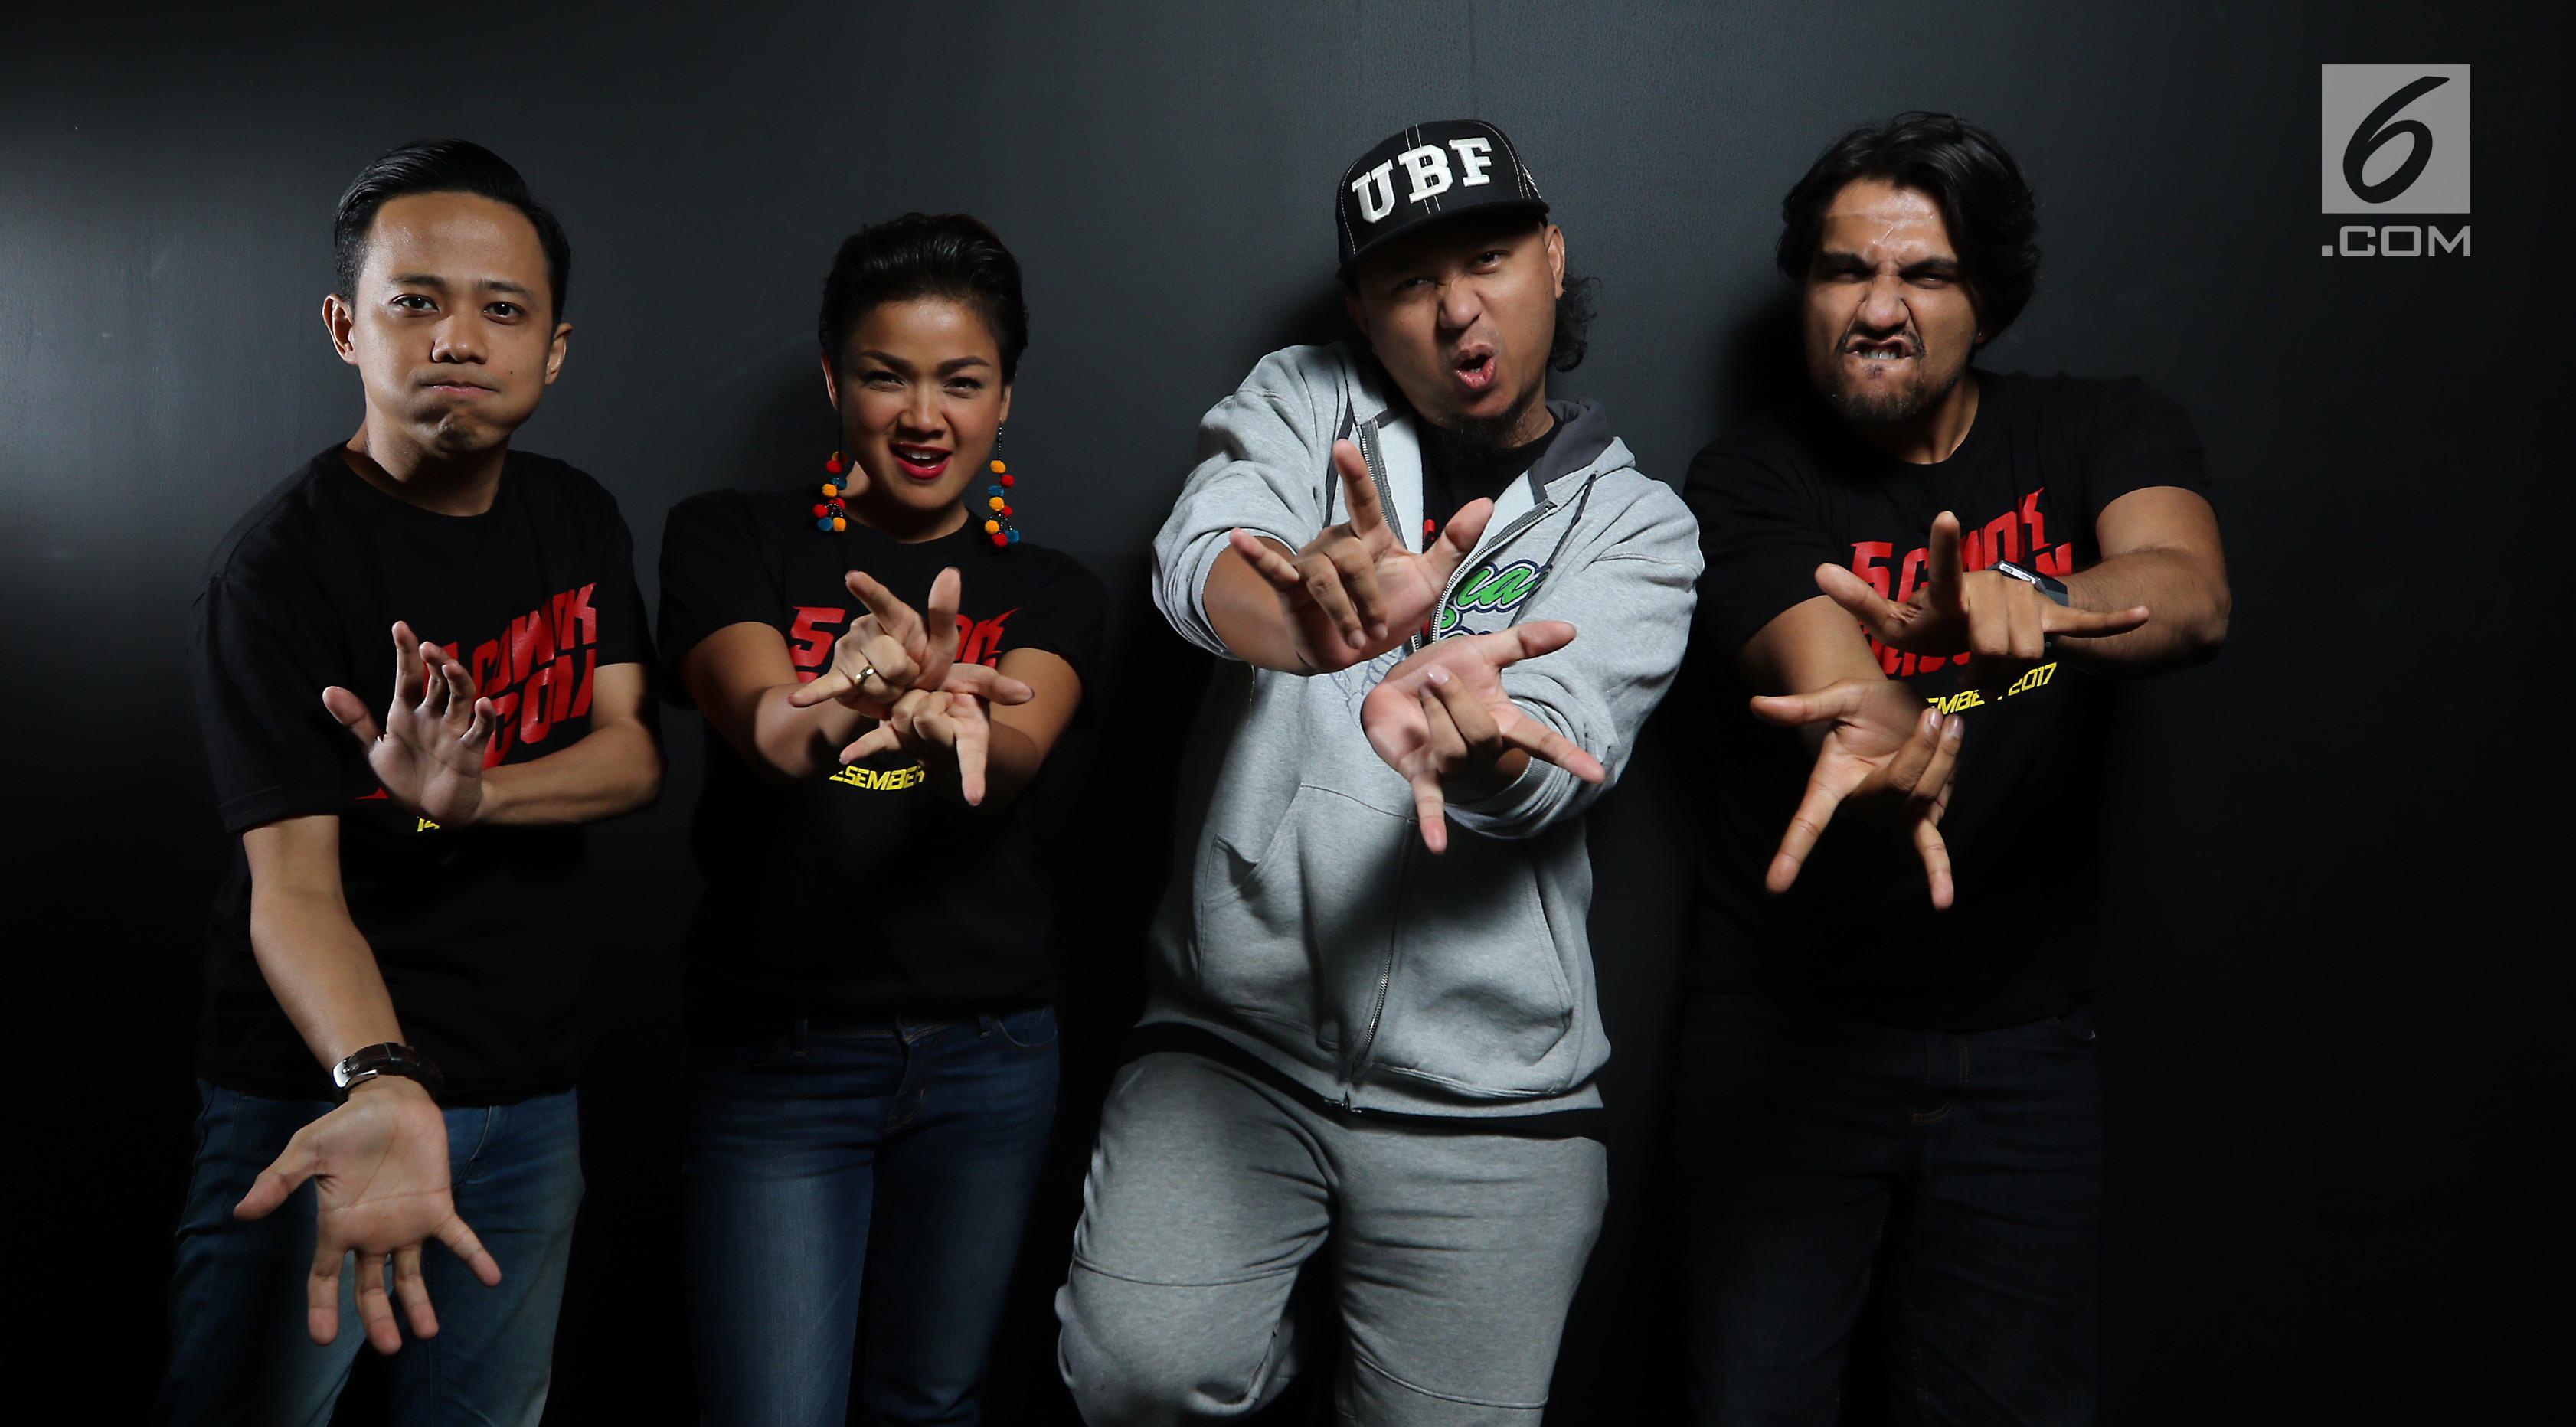 Pemain dan sutradara film 5 Cowok Jagoan, Muhadkly Acho, Nirina Zubir, Anggy Umbara (kedua kanan) dan Cornelio Sunny. (Liputan6.com/Fatkhur Rozaq)